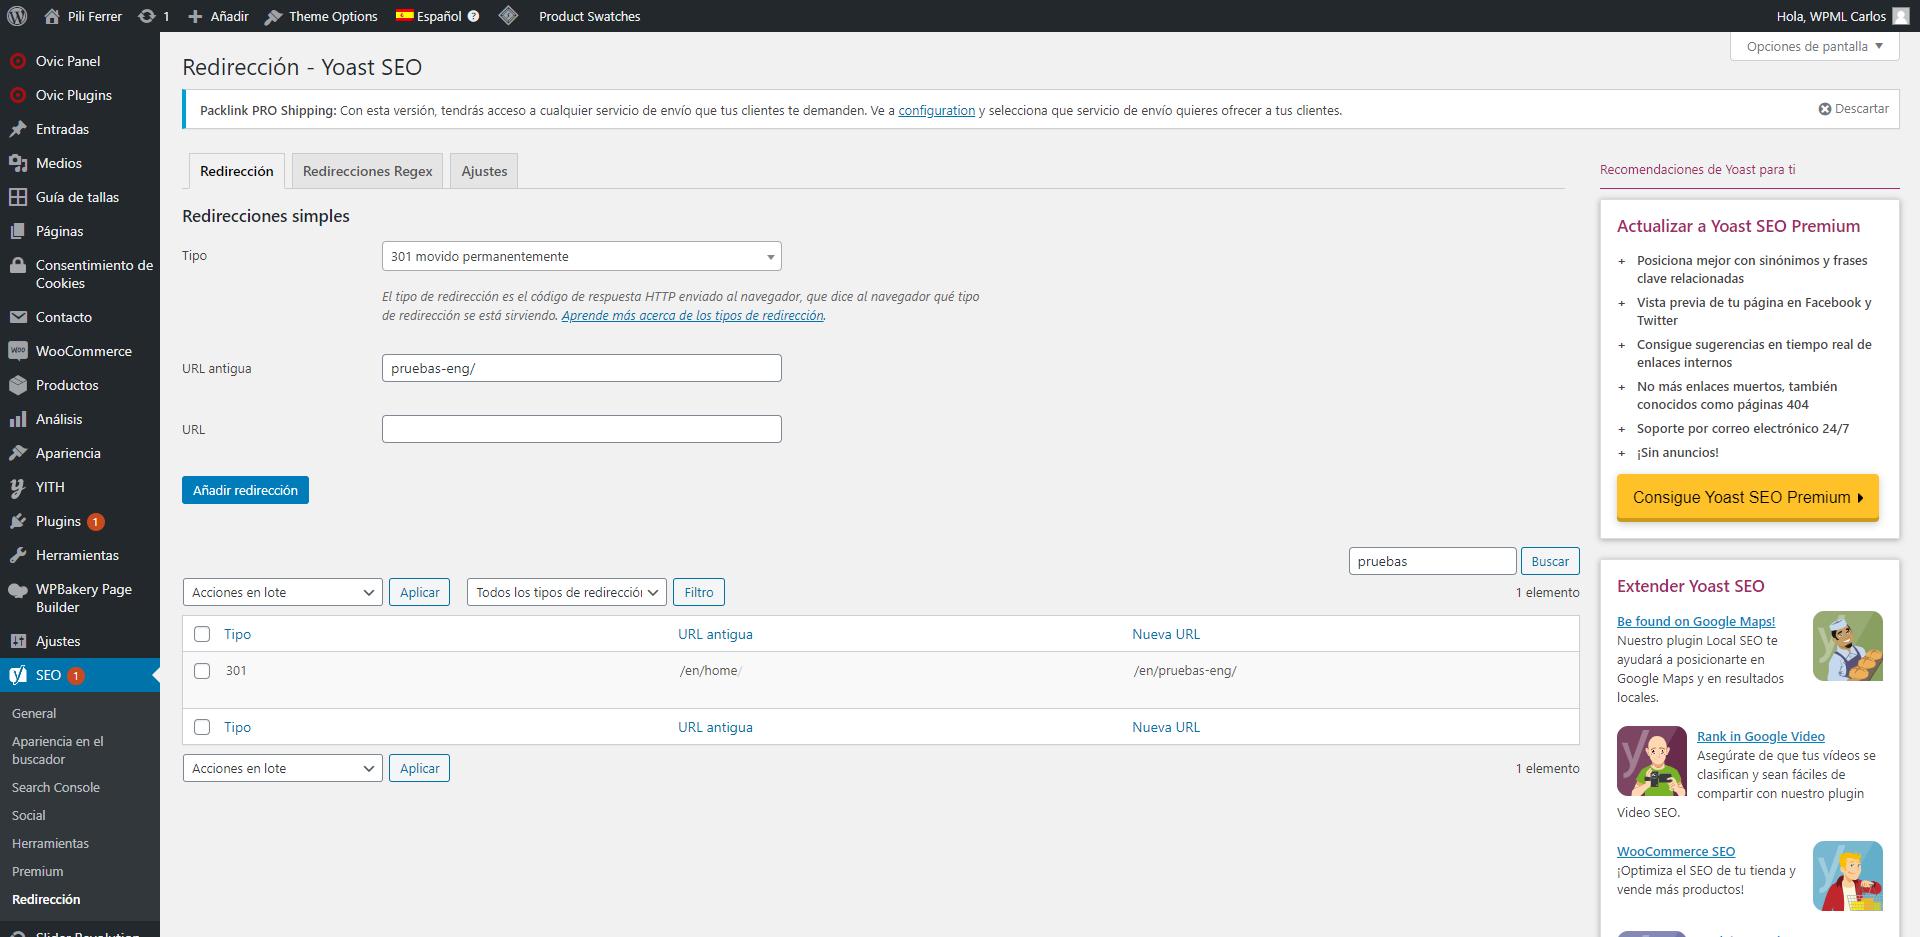 FireShot Capture 808 - Redirección - Yoast SEO ‹ Pili Ferrer — WordPress - beta.piliferrer.com.png